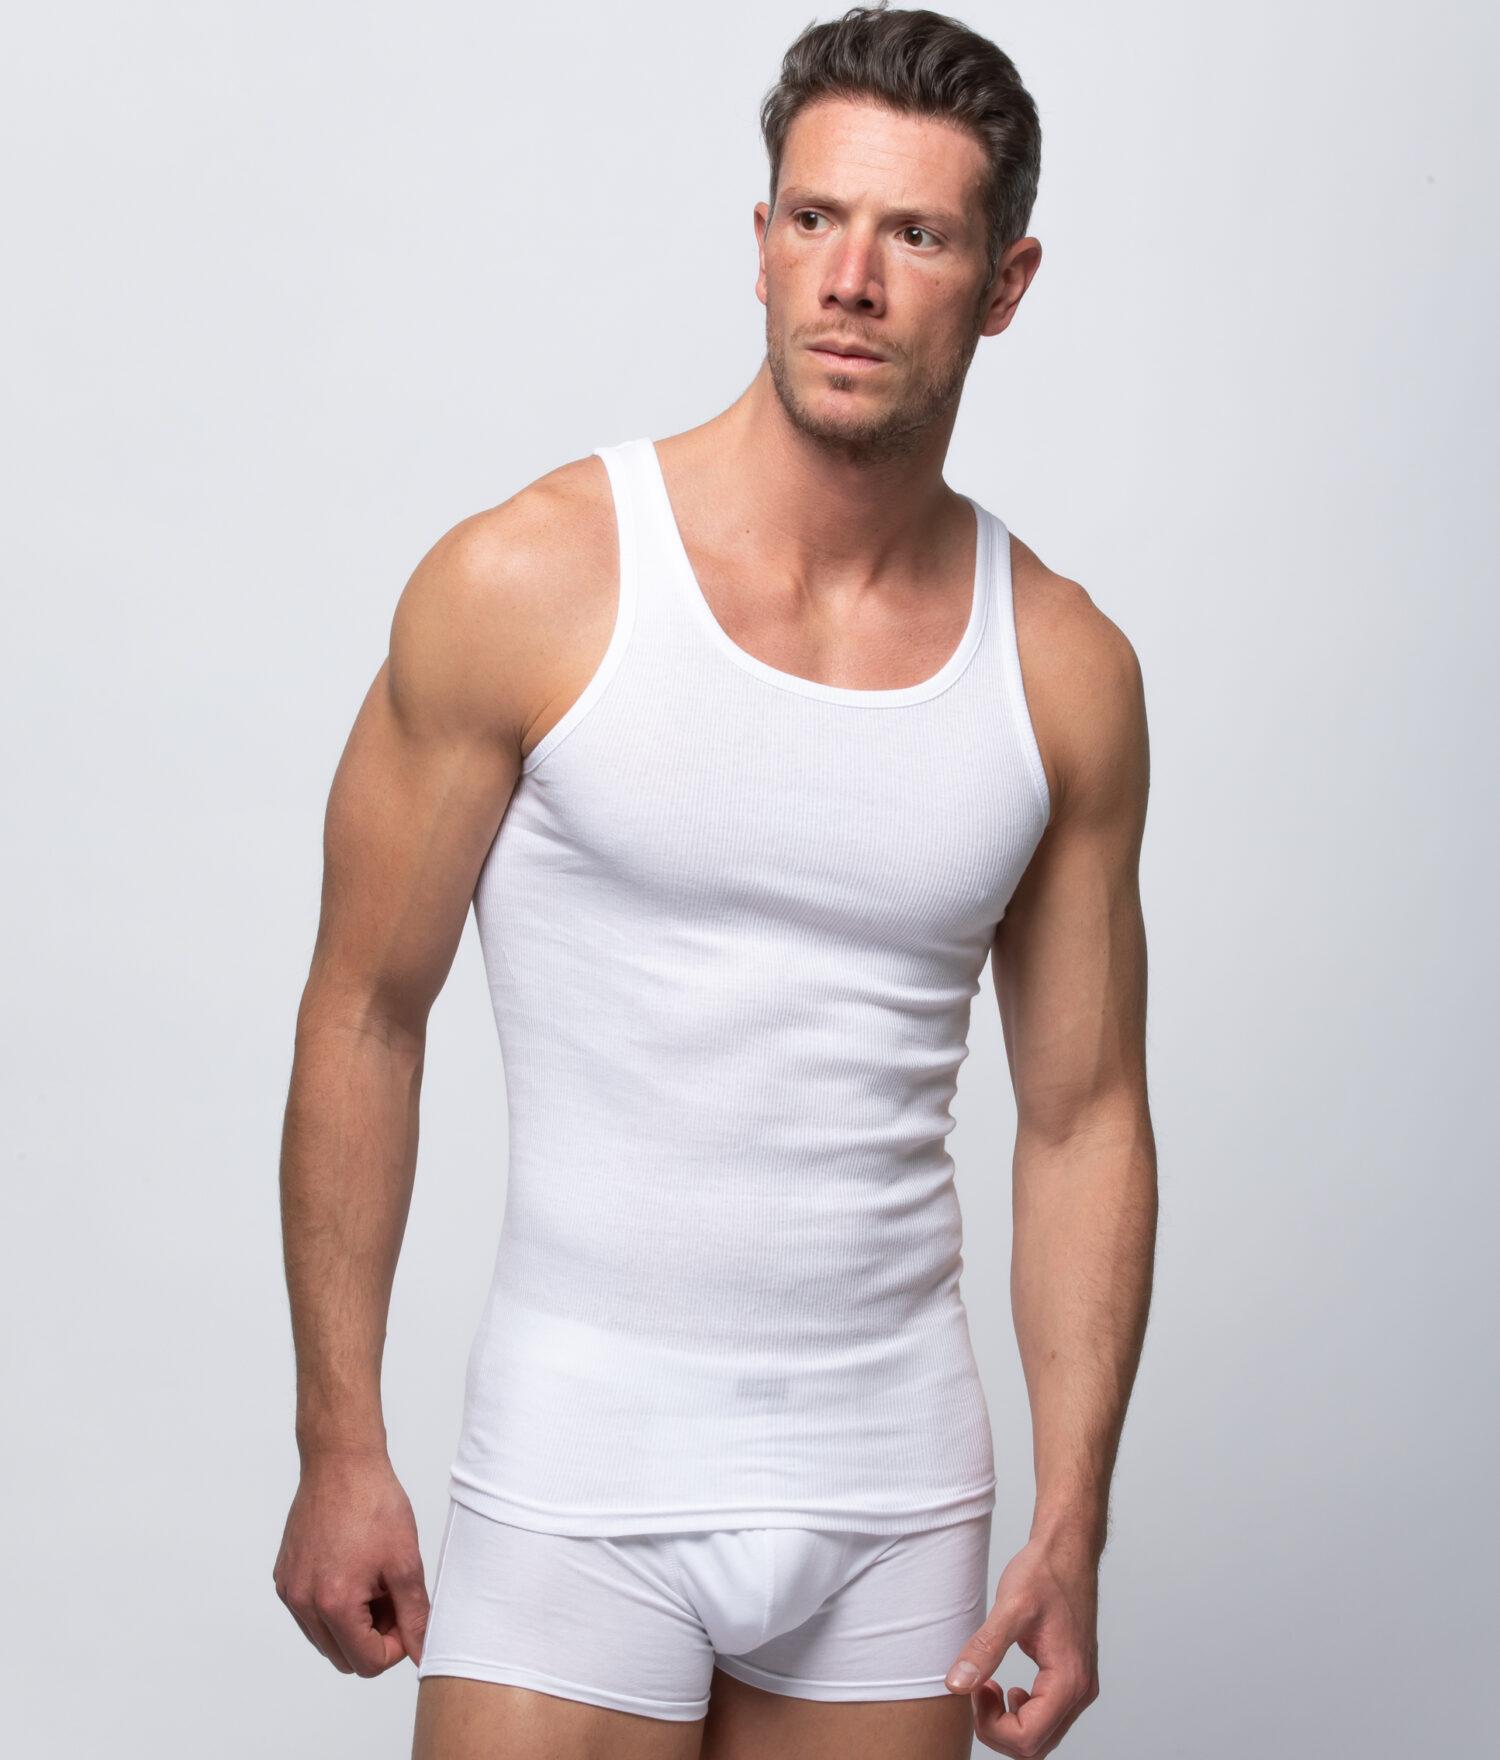 Camiseta tirantes ocean 2211 - Comprar online BIGARTE